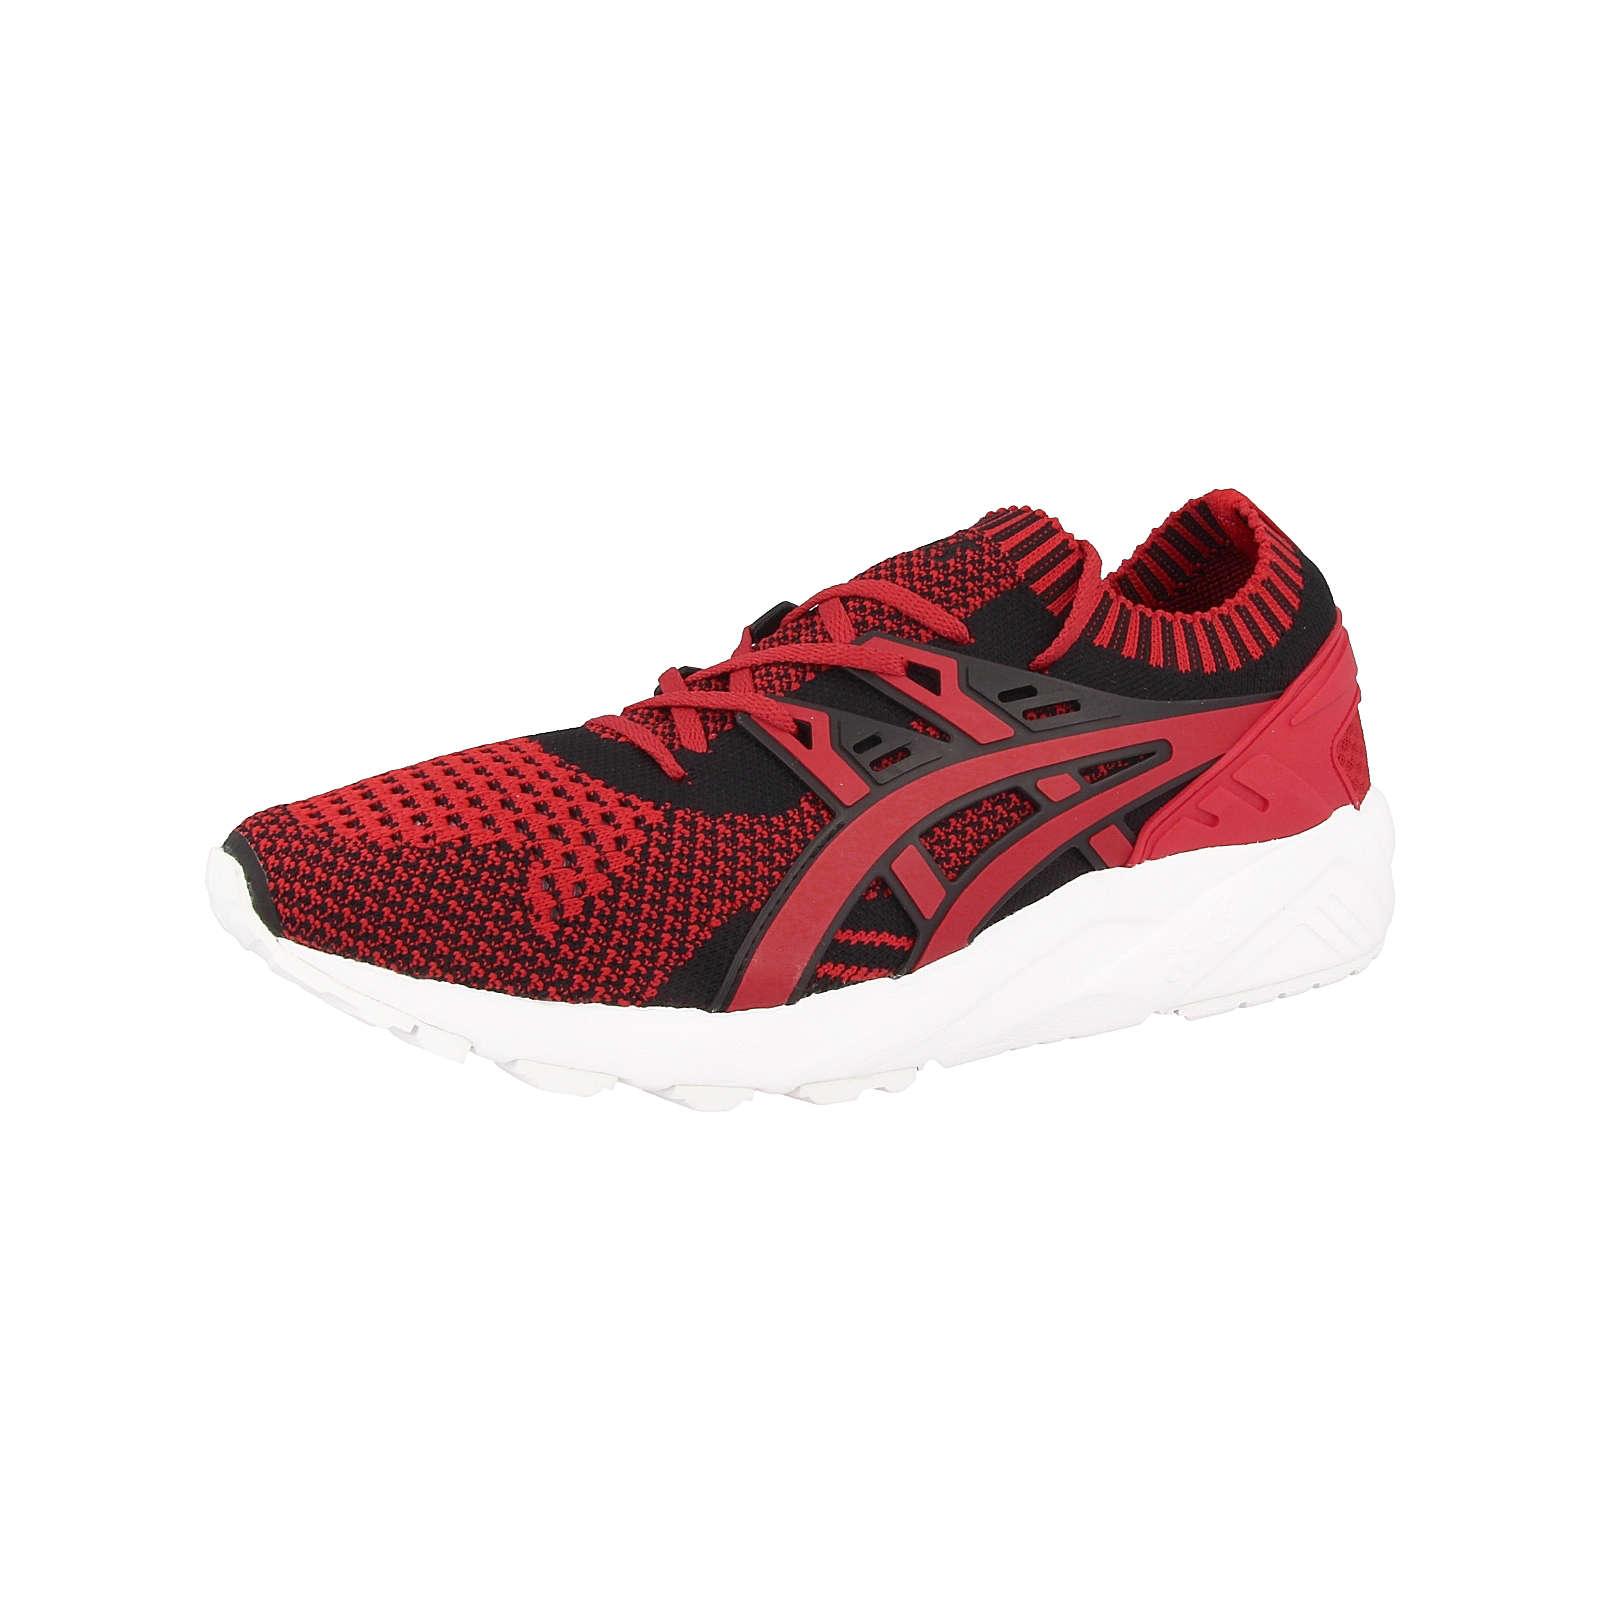 ASICS Gel-Kayano Trainer Knit Sneakers Low rot Herren Gr. 41,5